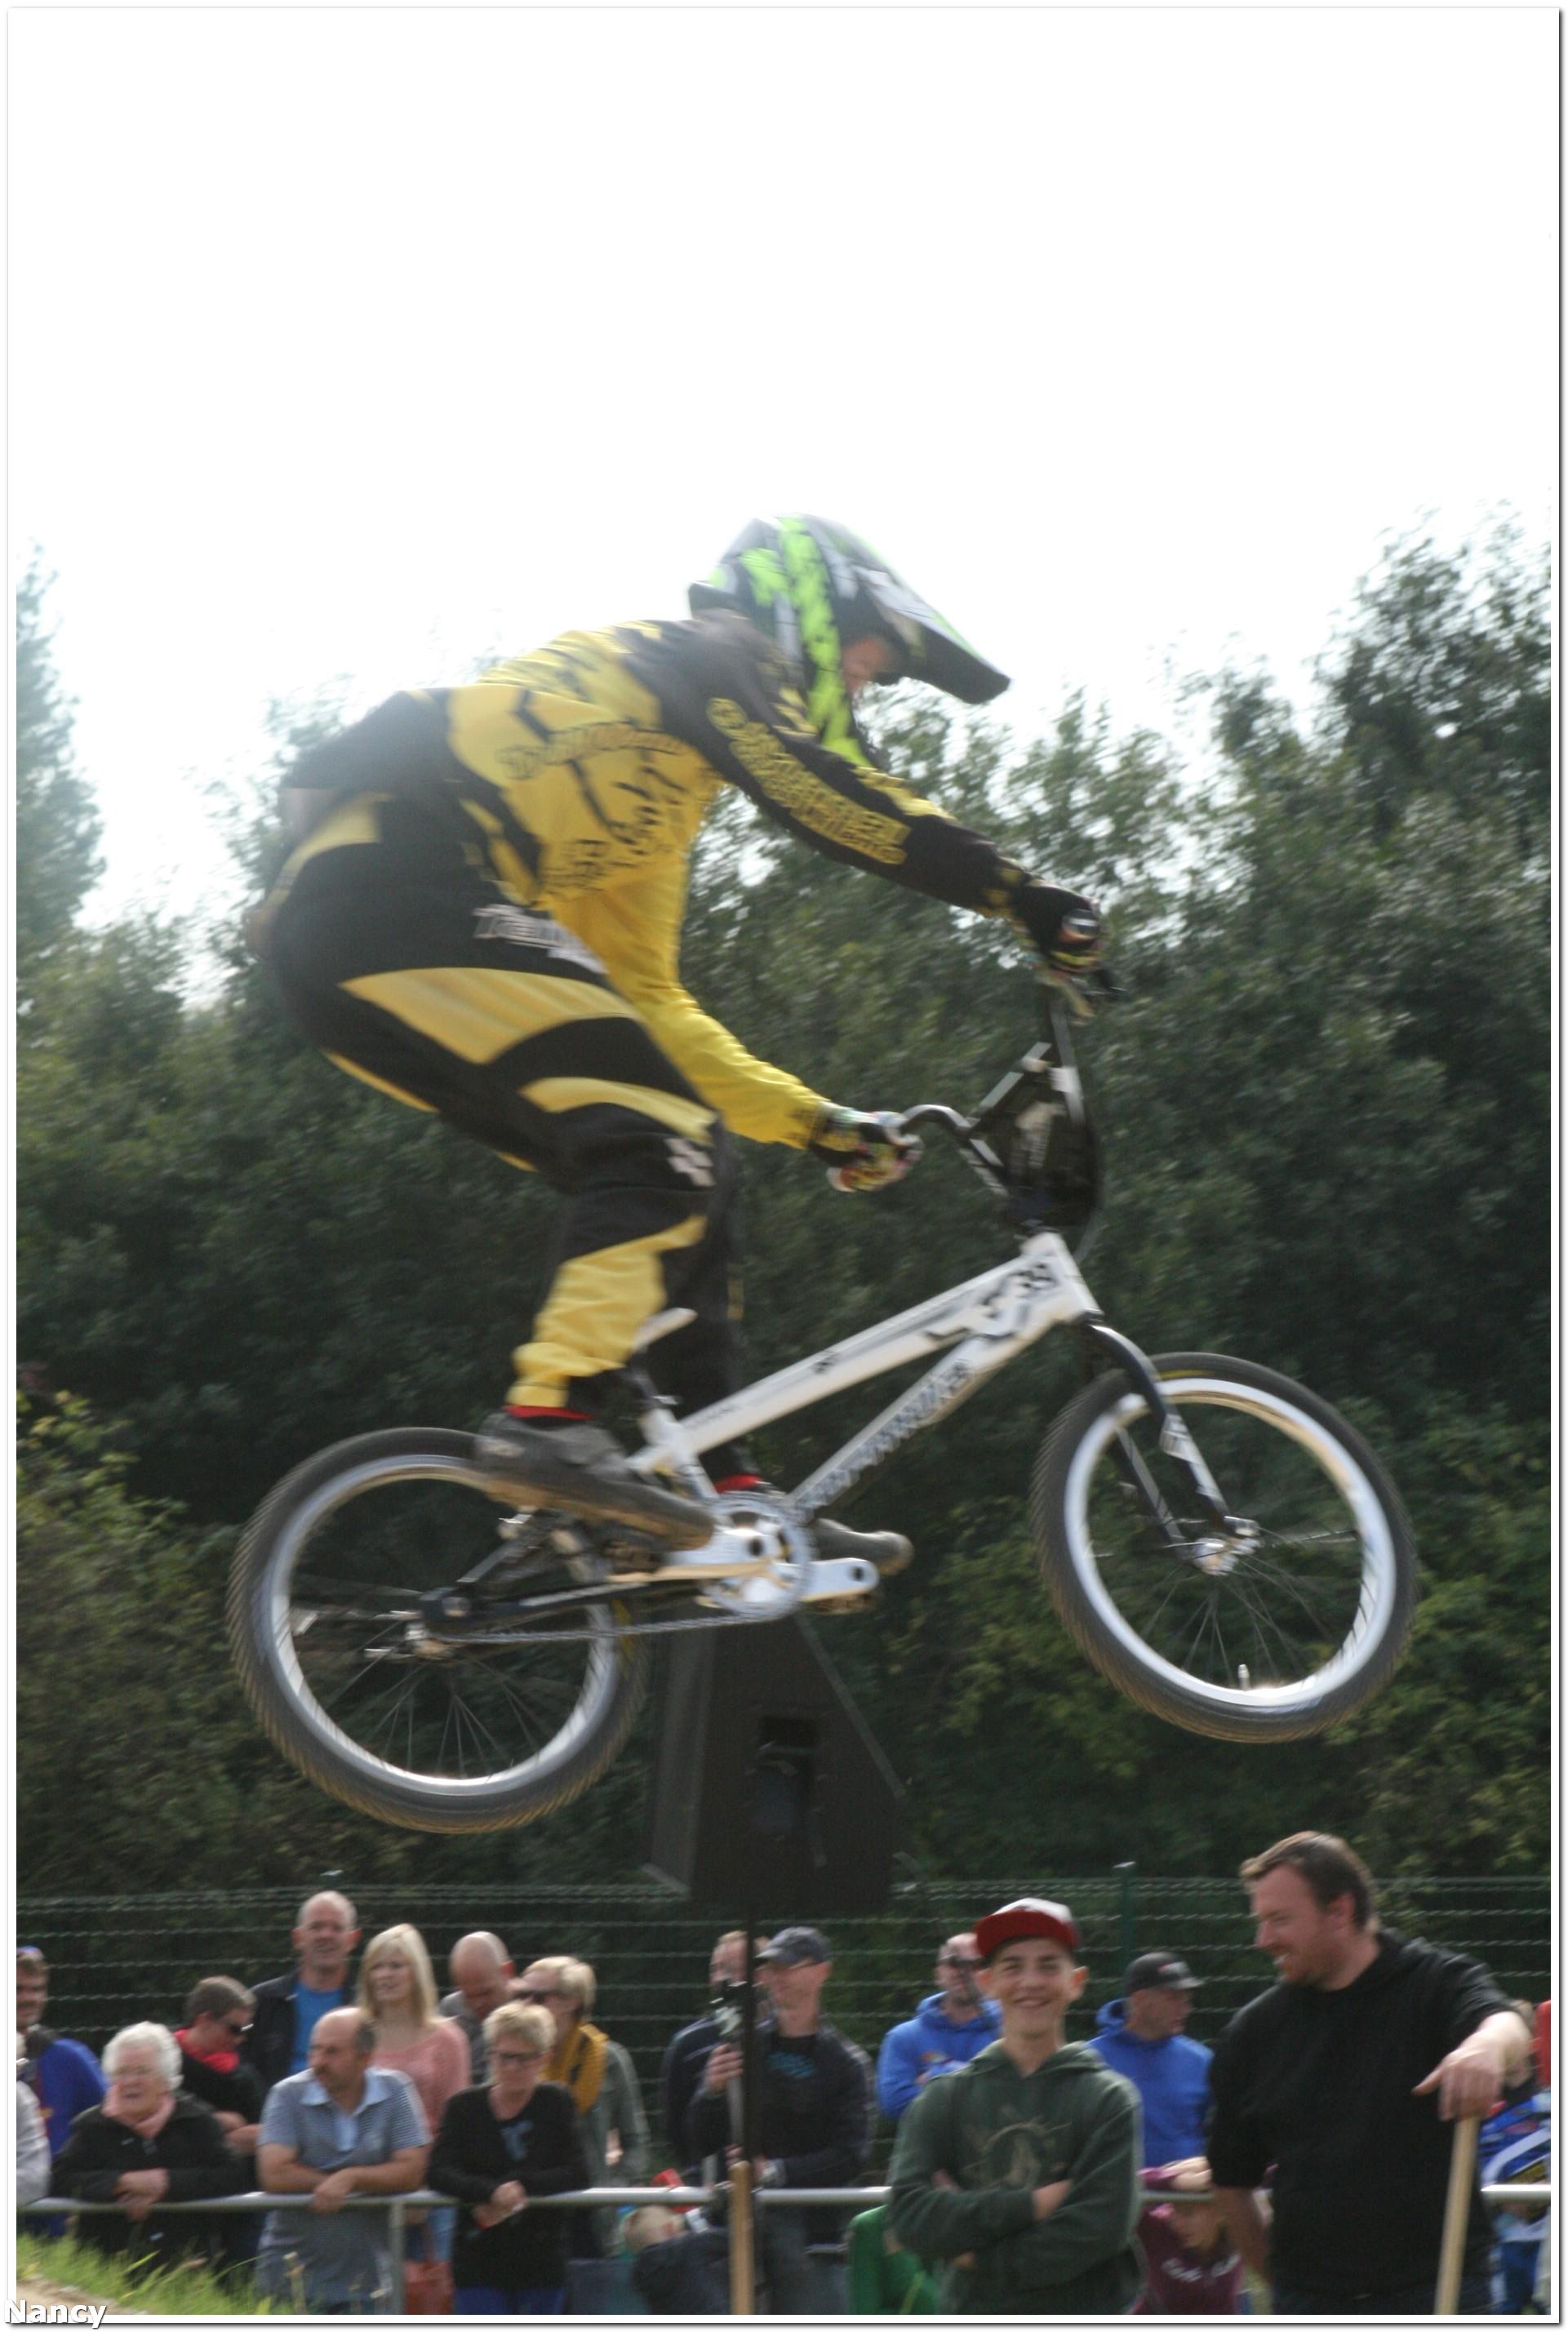 BMX kalender 2013 voor Nederland